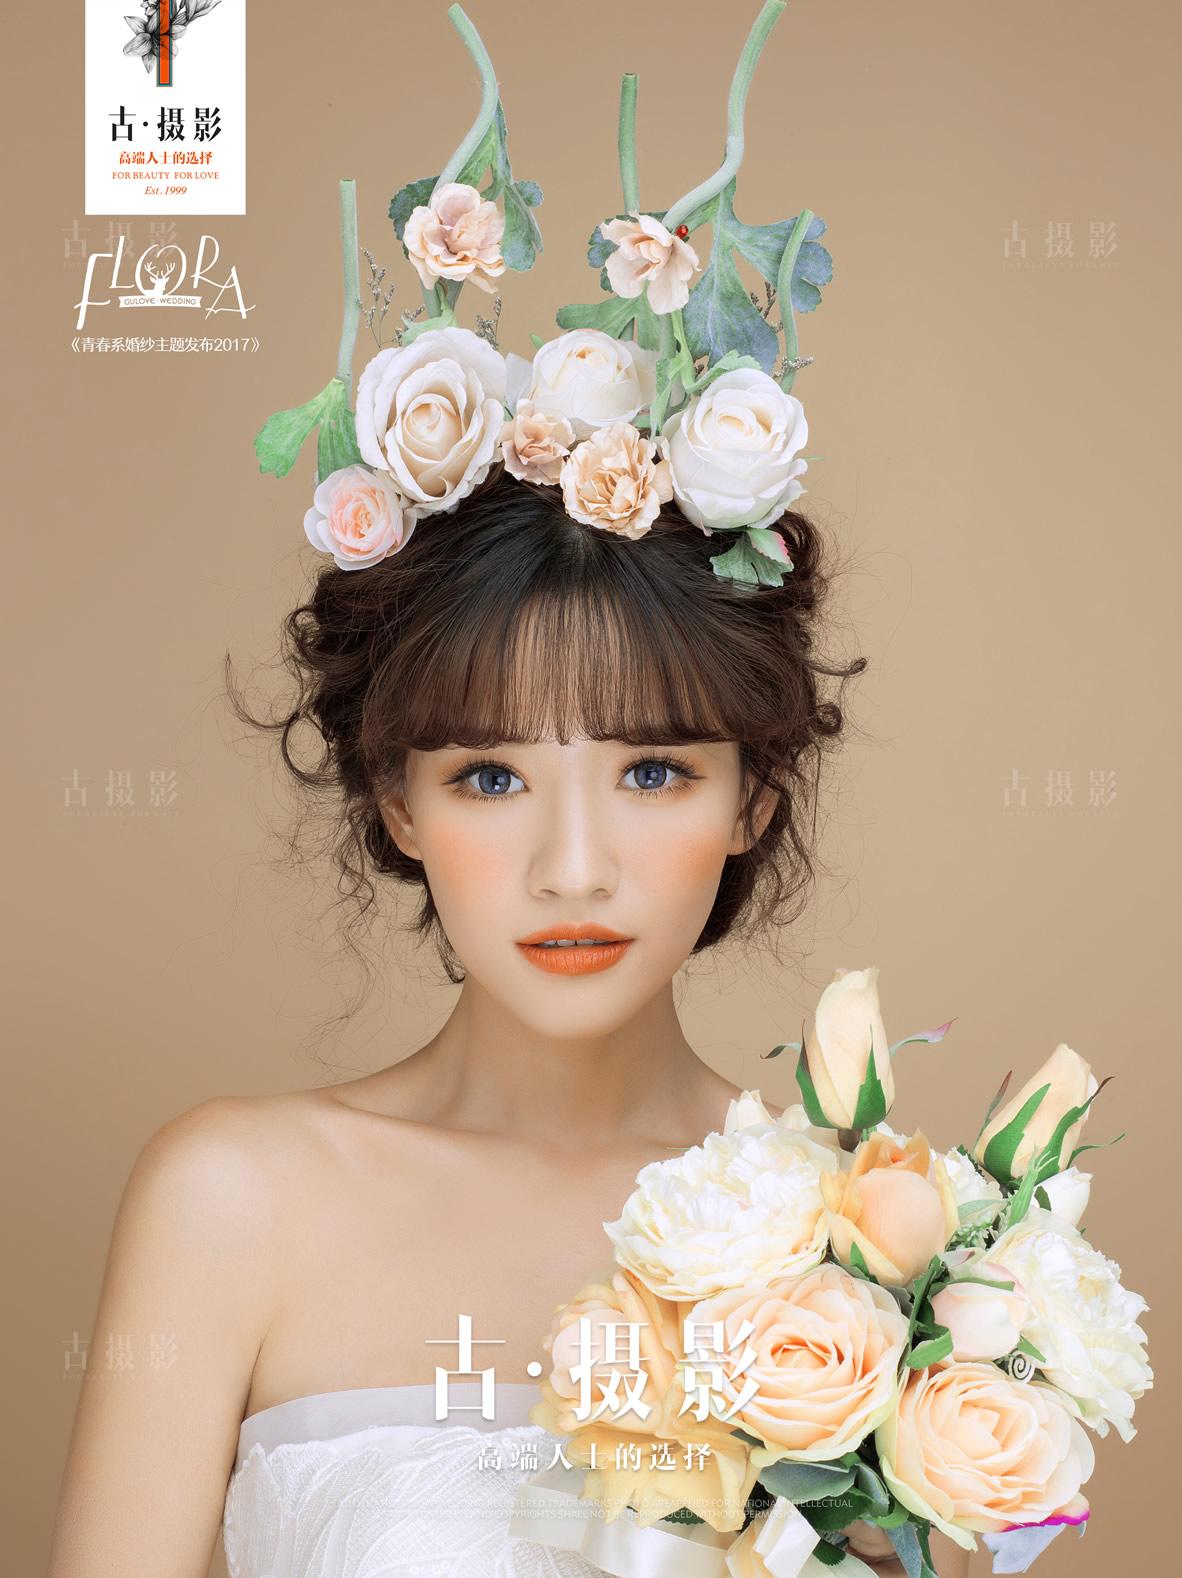 flowers Ⅲ - 明星范 - love昆明古摄影-昆明婚纱摄影网